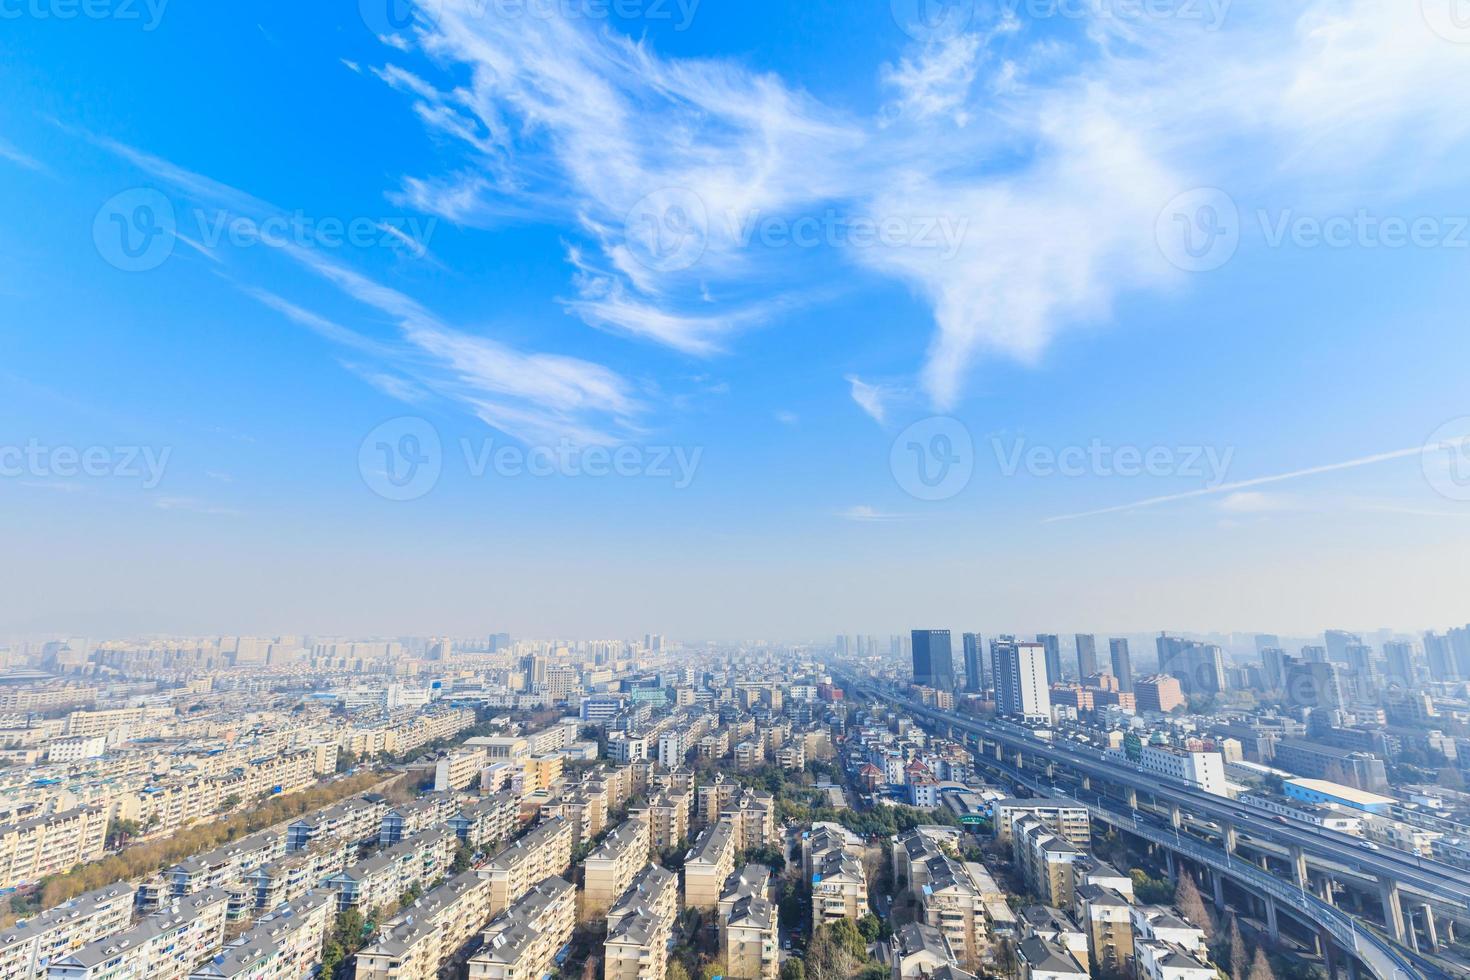 Hangzhou urban residential areas scenery photo